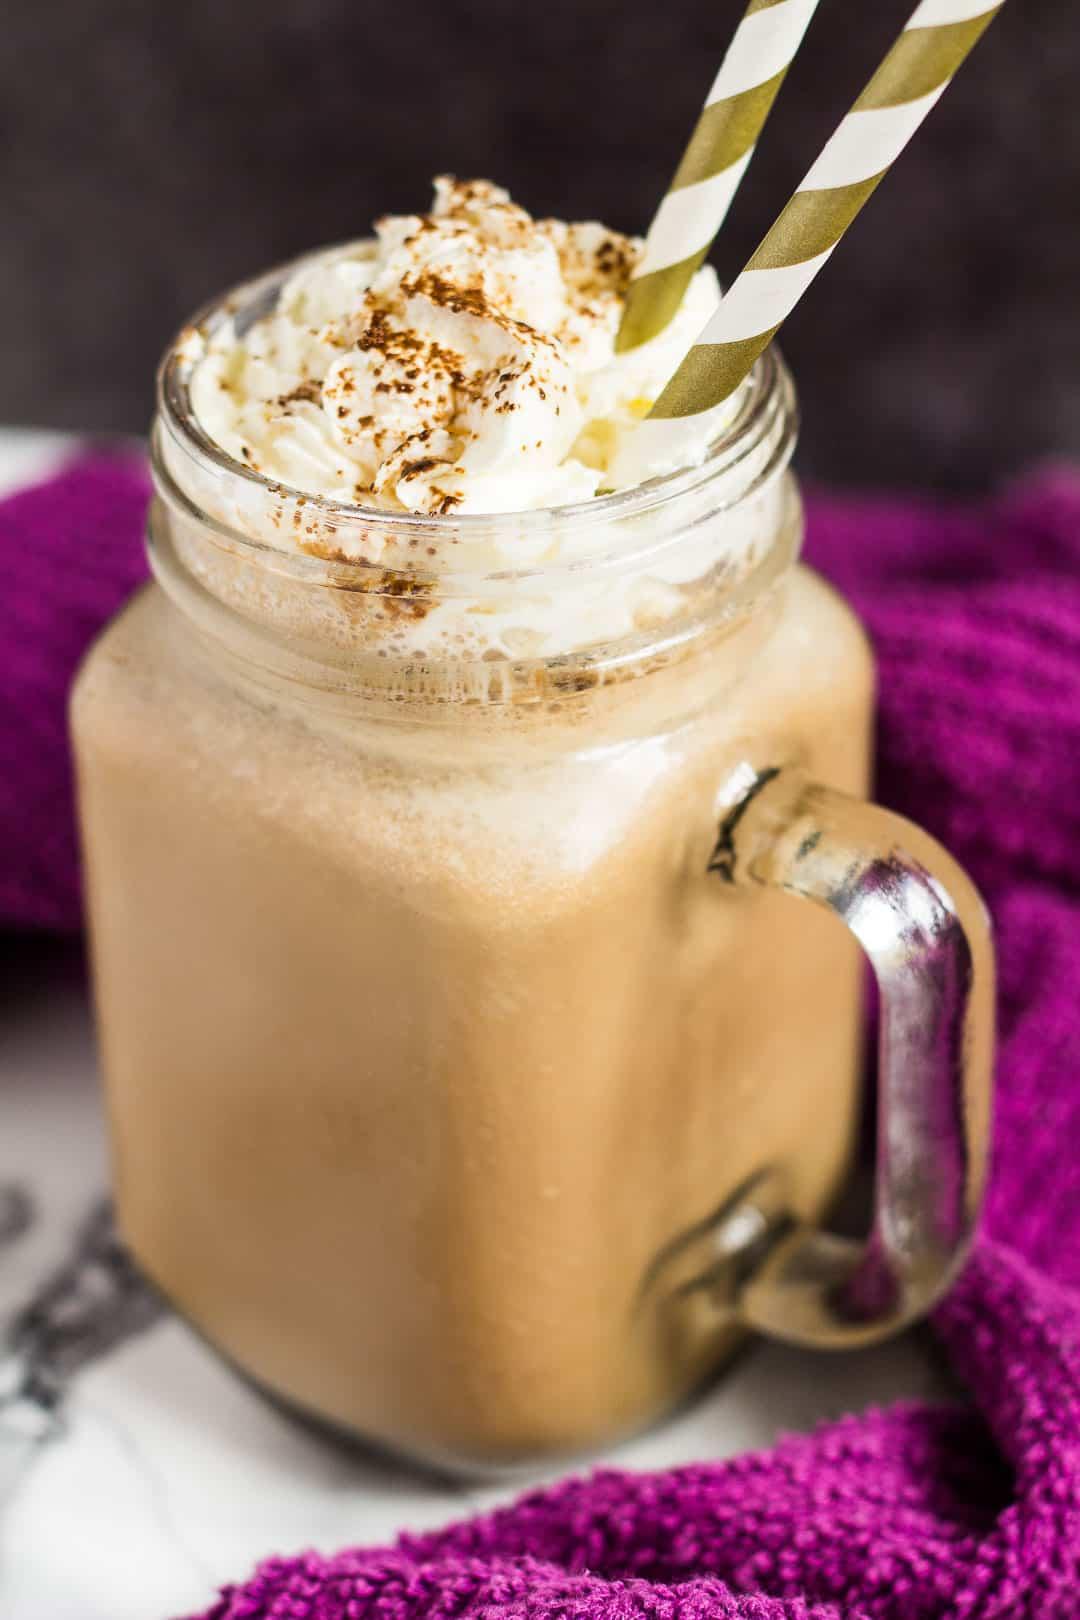 Banana Coffee Milkshake- Wonderfully creamy banana milkshake that is infused with coffee. Indulgent drink for coffee lovers! | marshasbakingaddiction.com | @marshasbakeblog